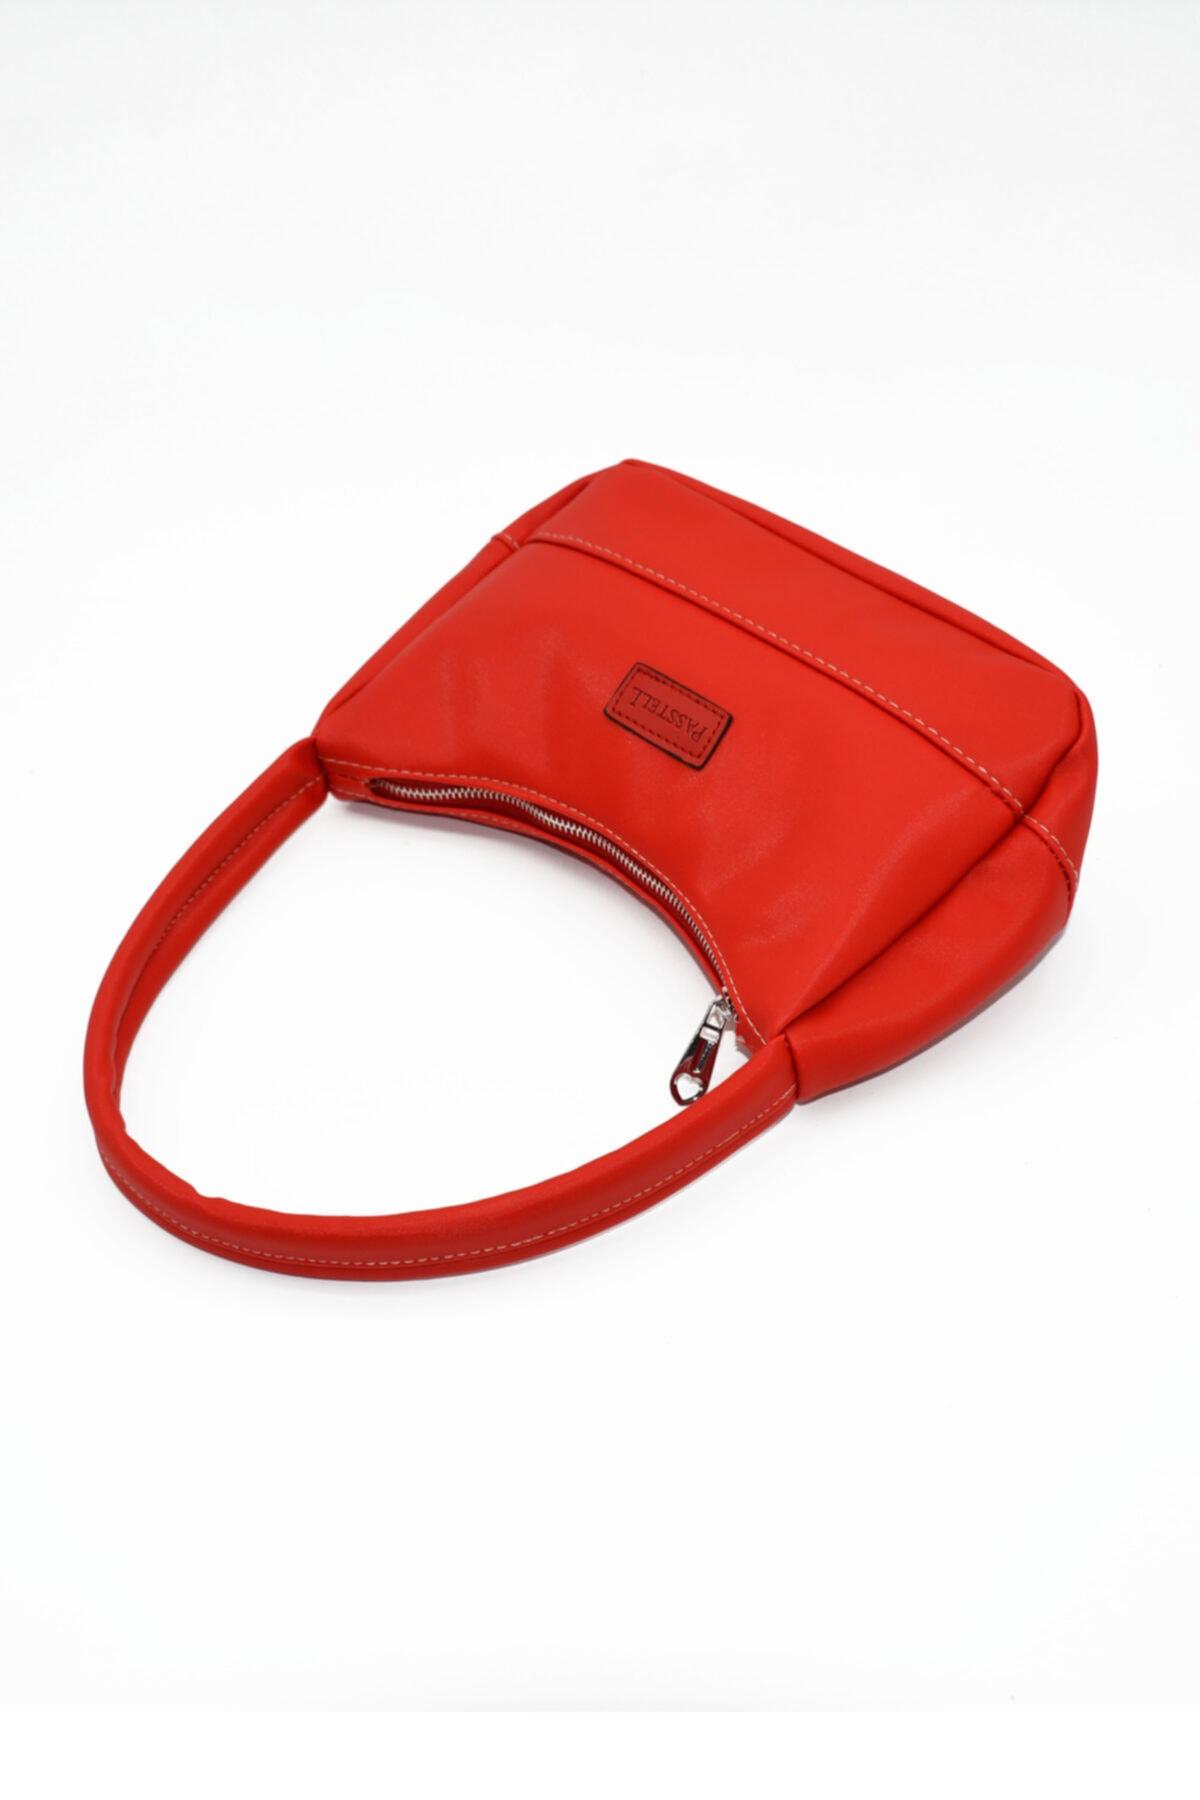 PASSTELL Bayan  Kırmızı  Saten Baget Çanta 1